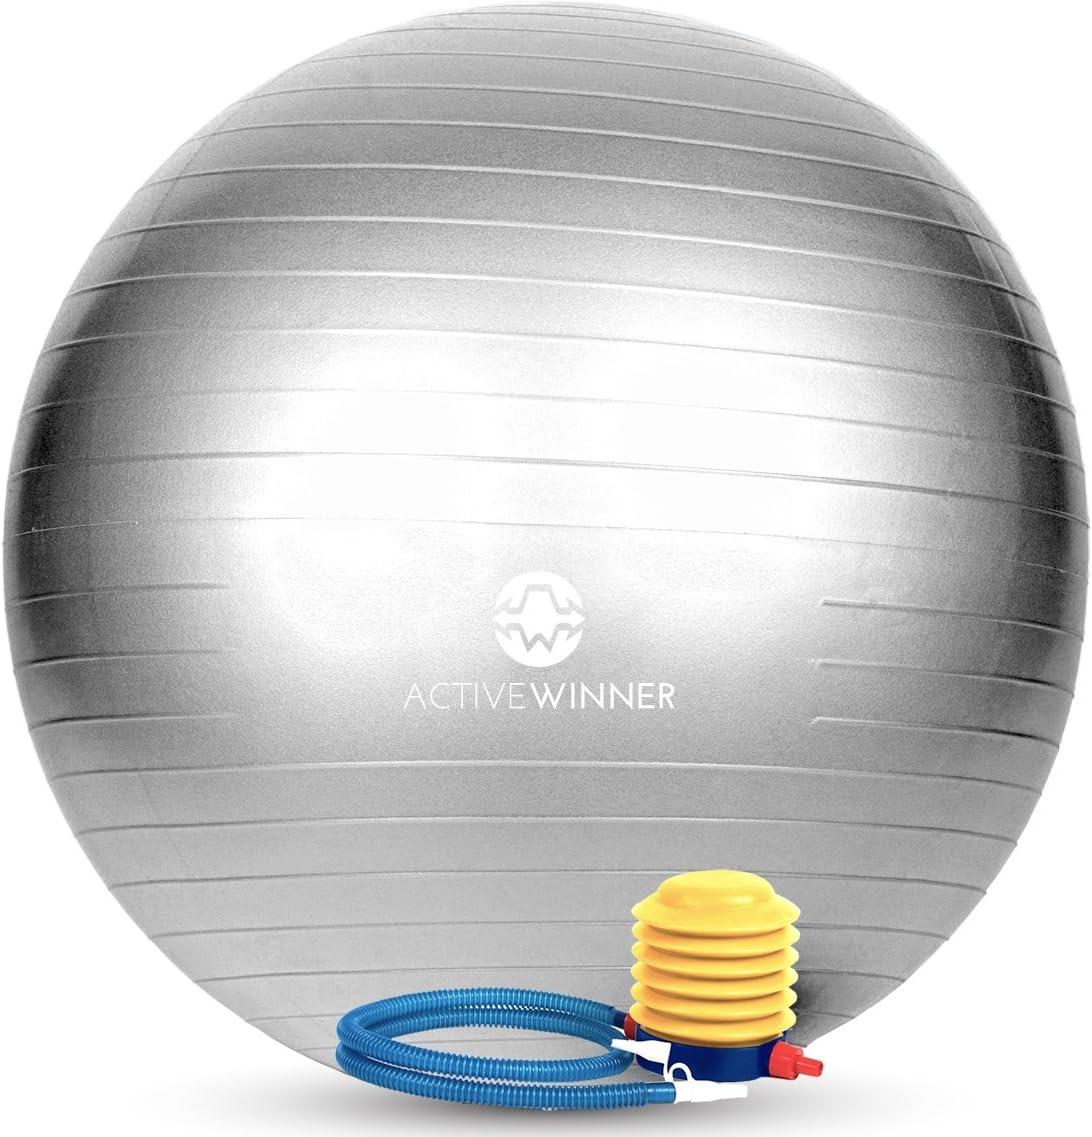 Active Winnerバランスボール 65/55cm アンチバースト 分厚い 滑り止め加工 フットポンプ付 ヨガ ピラティス 筋トレ ストレッチ オフィスチェア